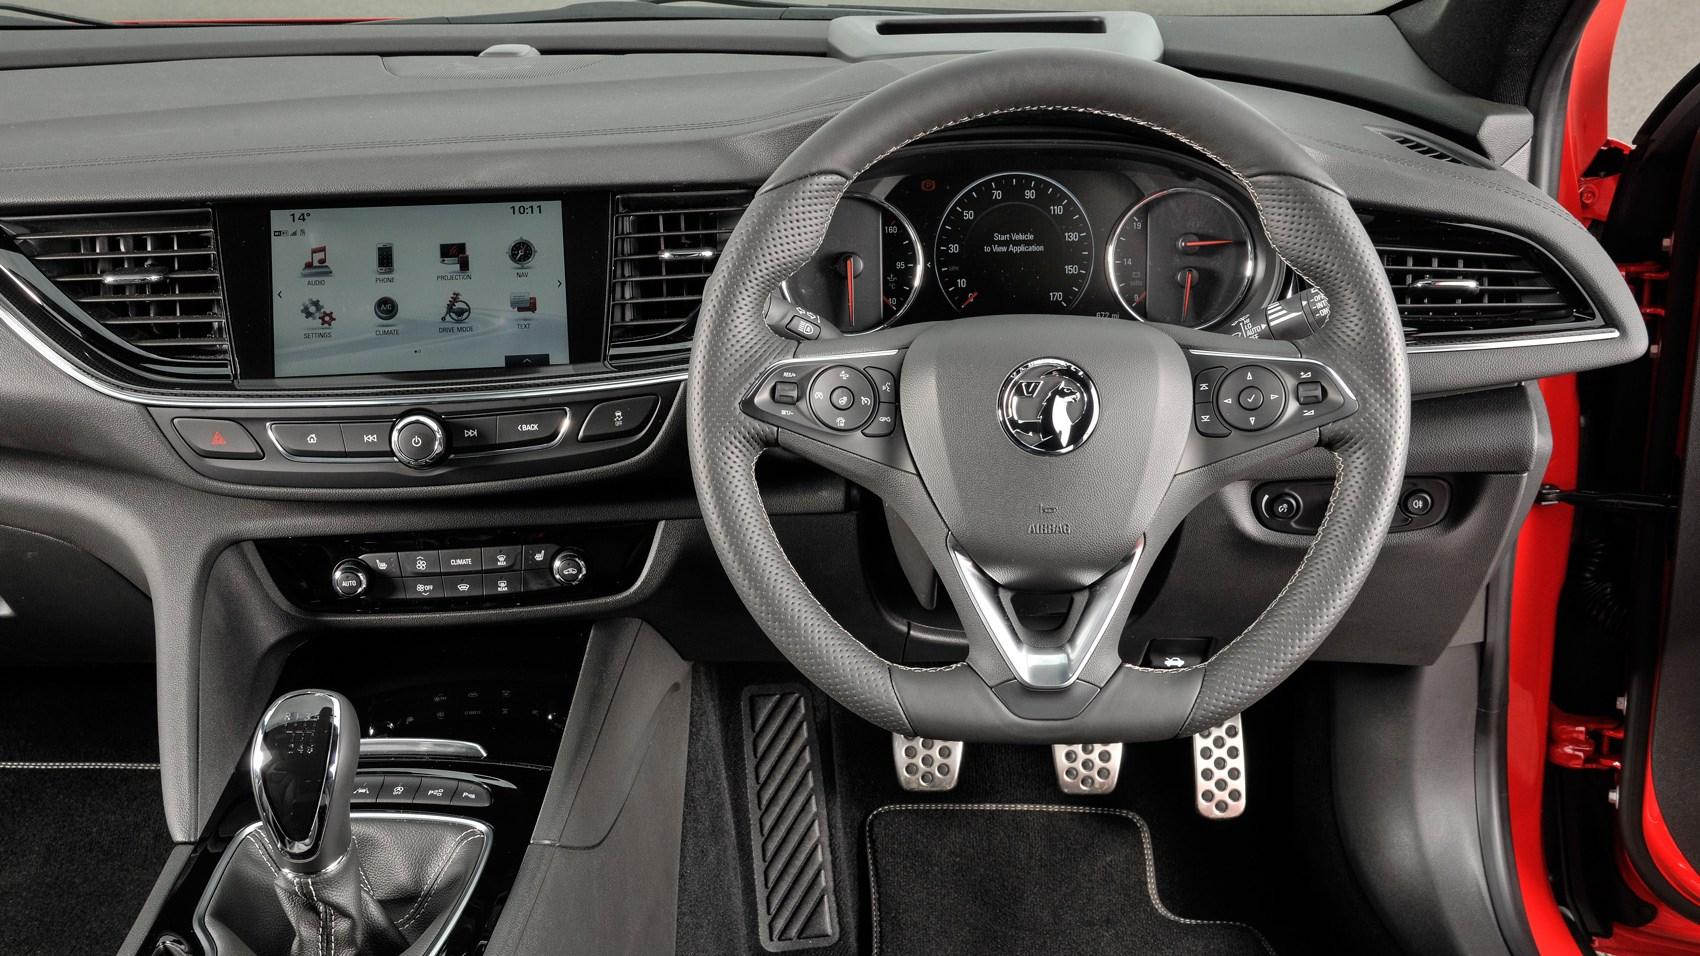 0 Down Lease Deals >> Vauxhall Insignia Sports Tourer (2017) review | CAR Magazine